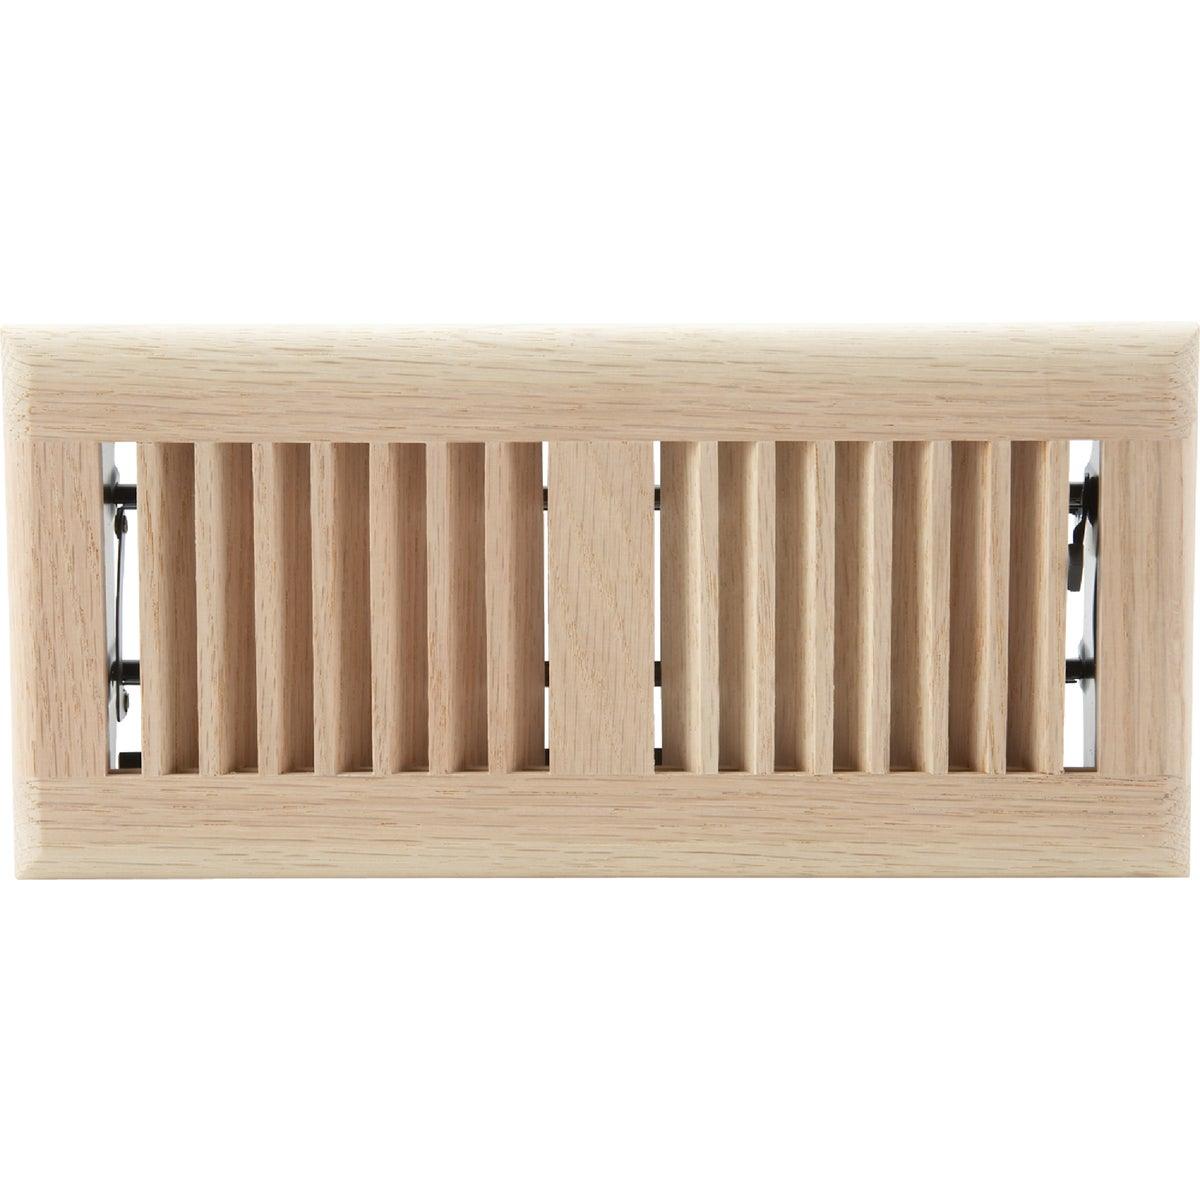 Home Impressions Natural Oak Floor Register, WF0410N0